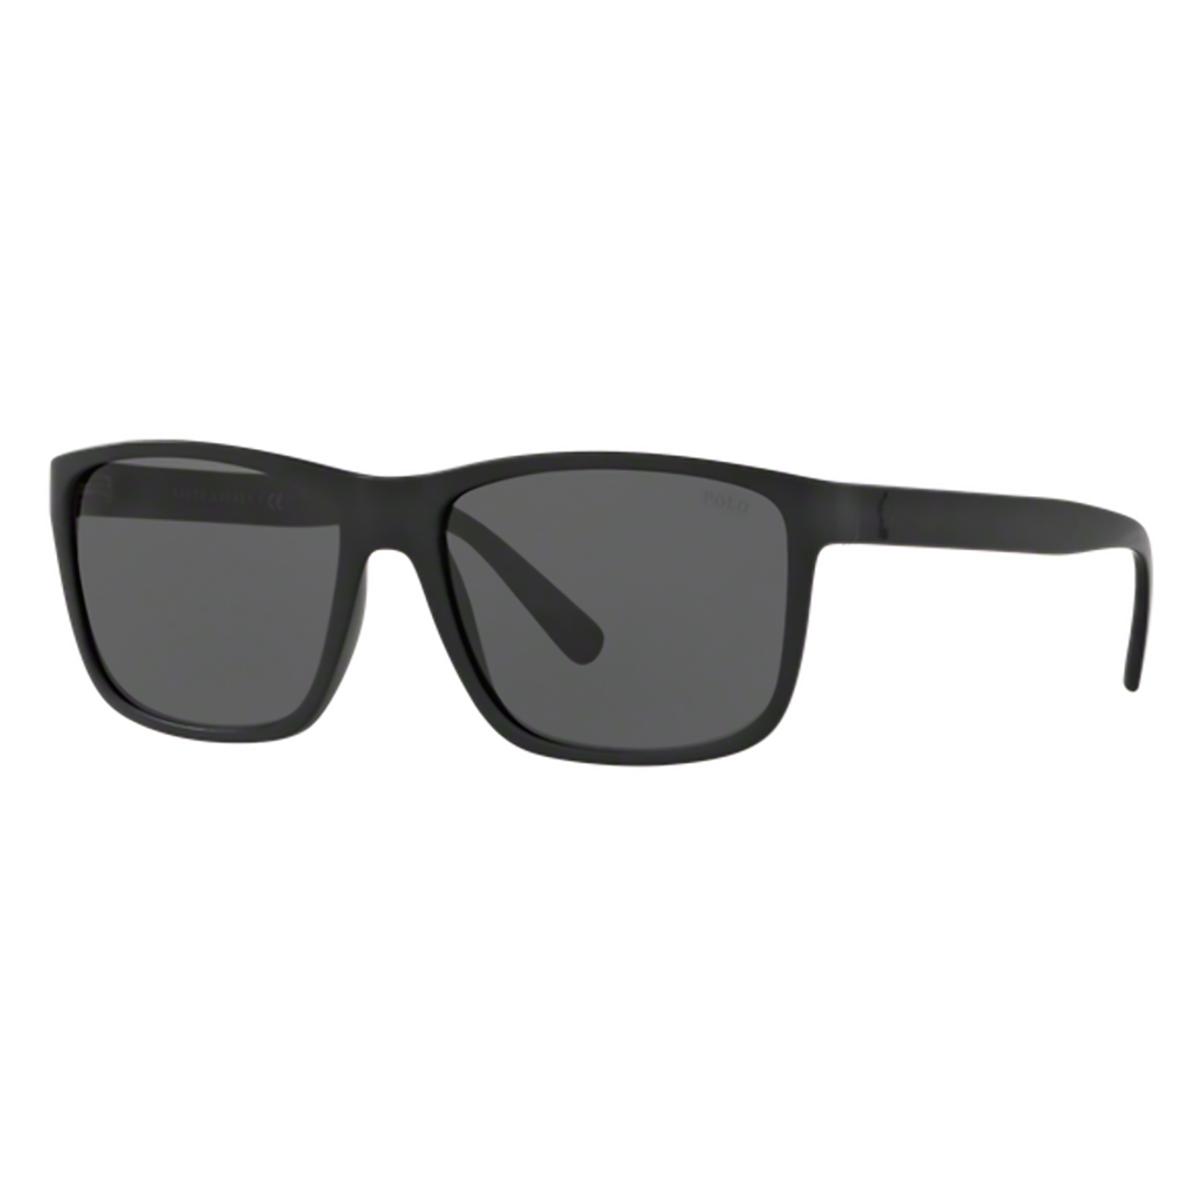 0434f0e2c0ffa Óculos de Sol Polo Ralph Lauren PH4113   Tri-Jóia Shop